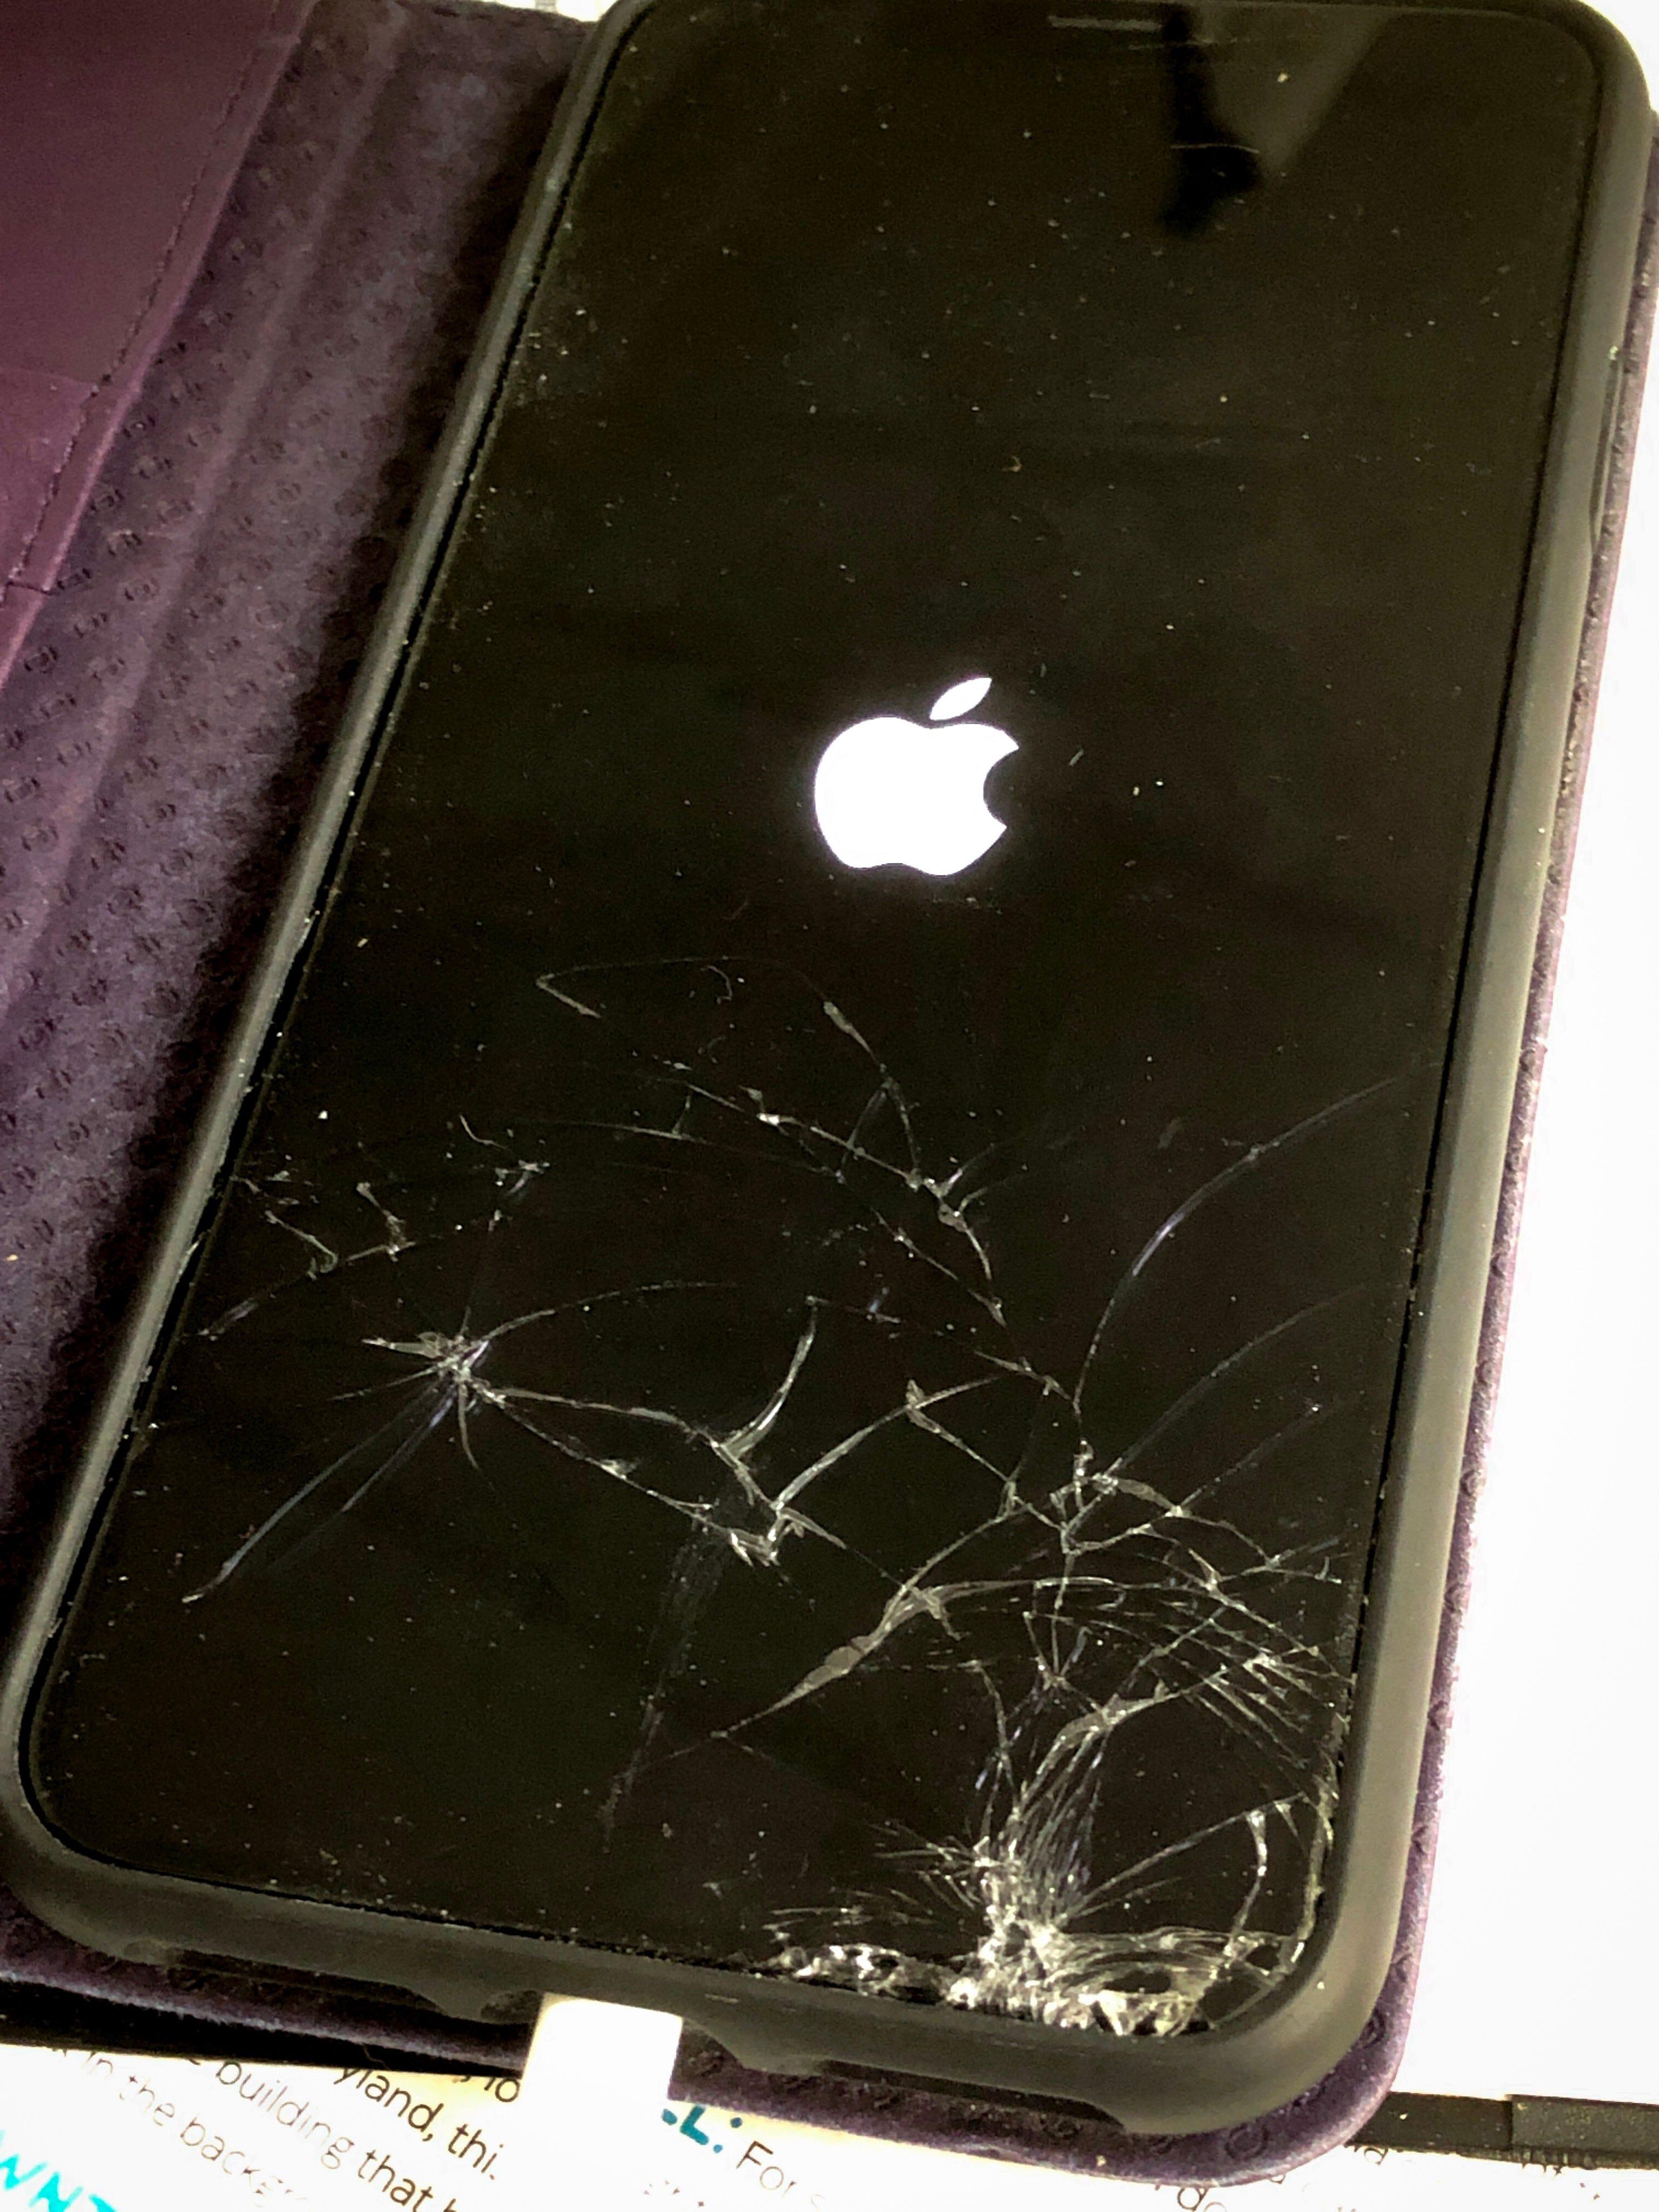 Why iPhone, Galaxy smartphone screens break so easily